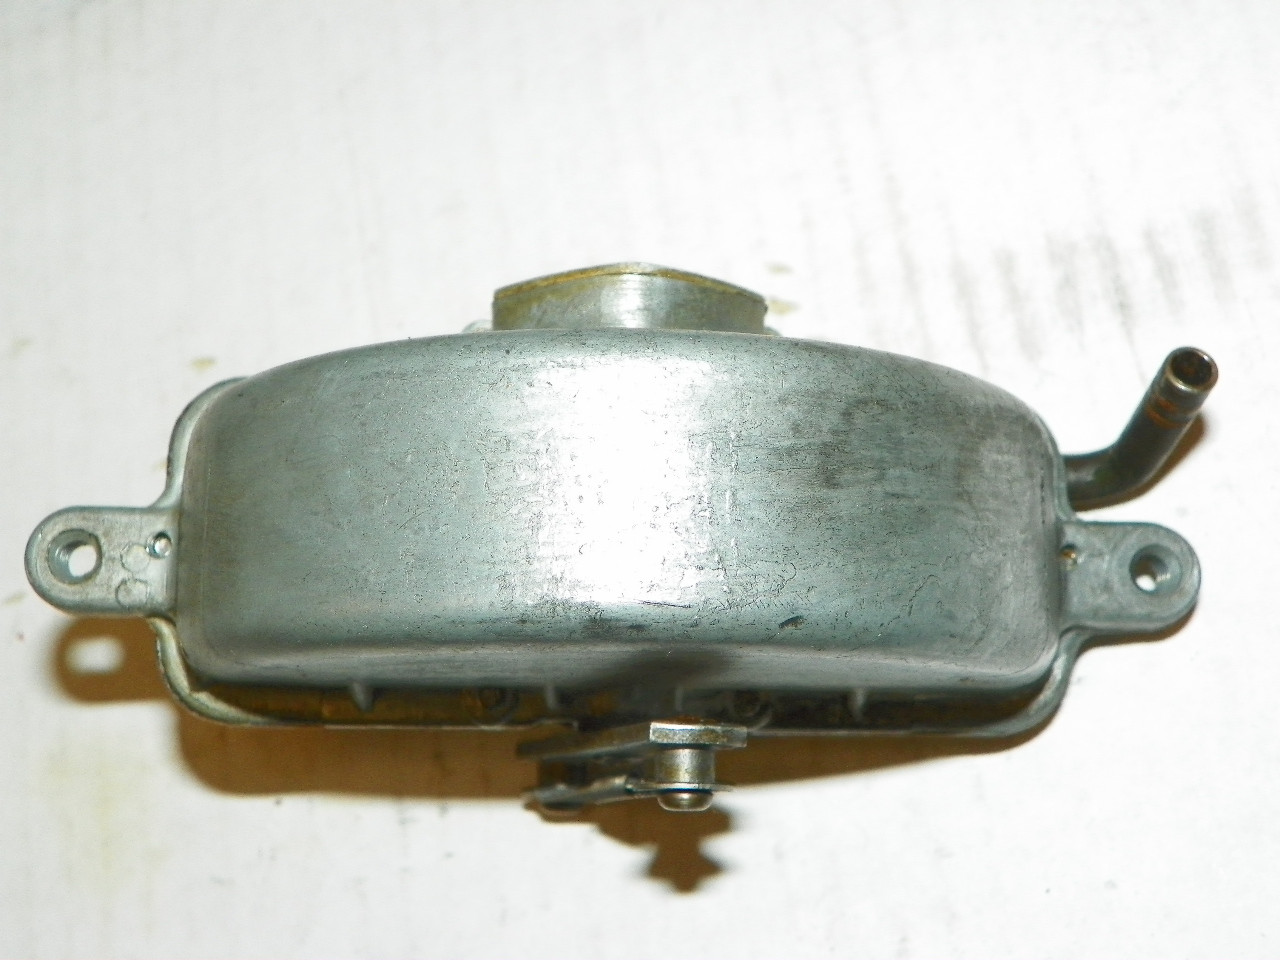 Part No.: SK 11-1 Manufacturer: Trico